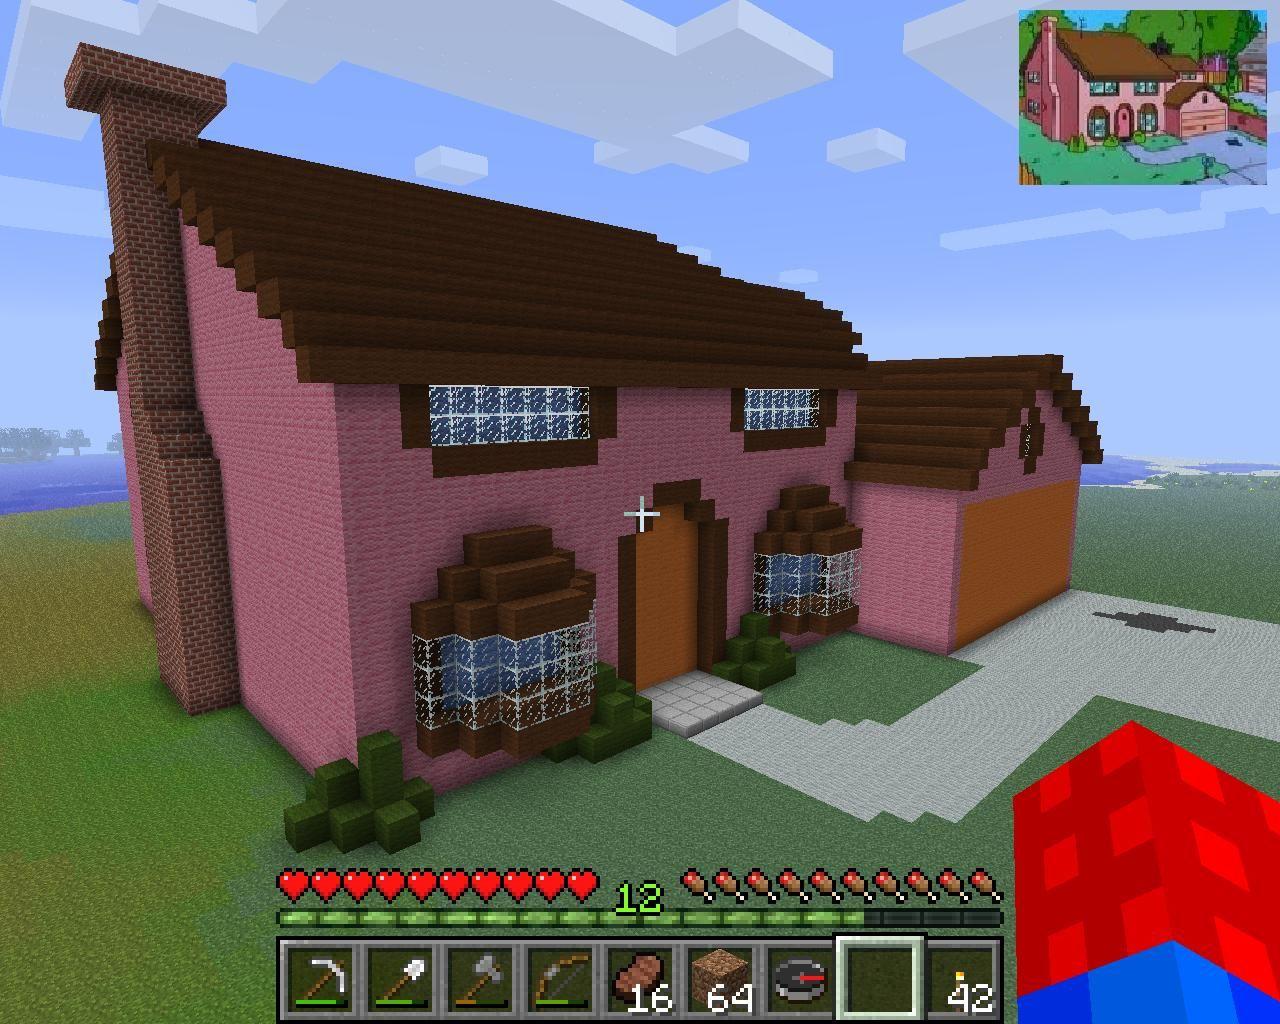 minecraft simpsons house  Cool minecraft houses, Minecraft